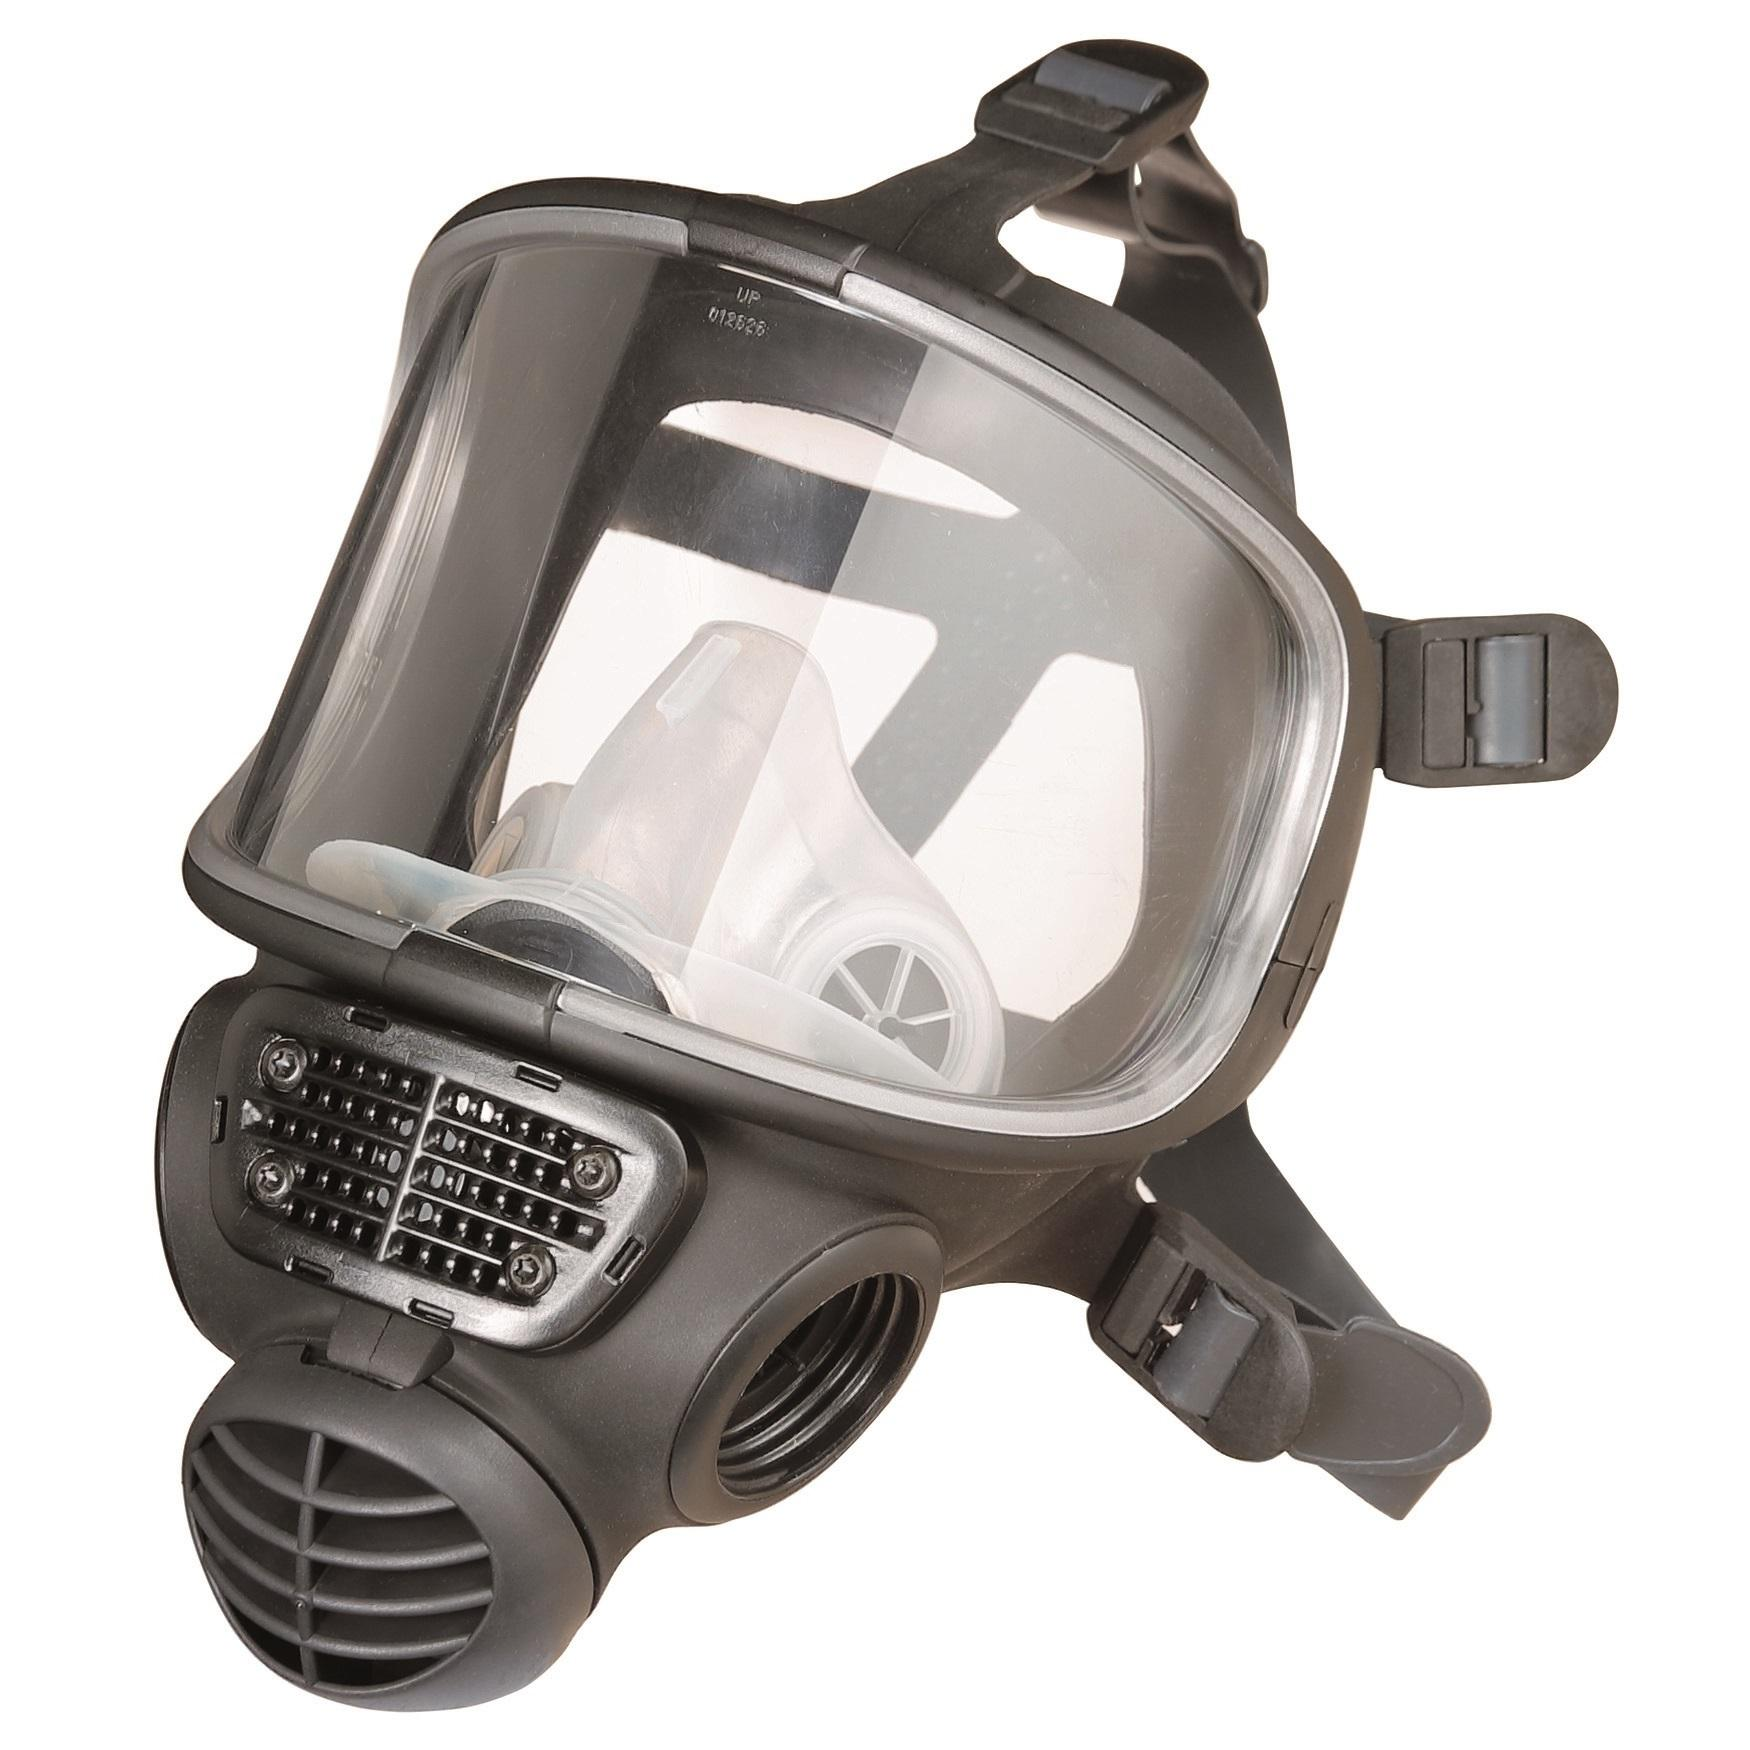 Promask Full Face Respirator